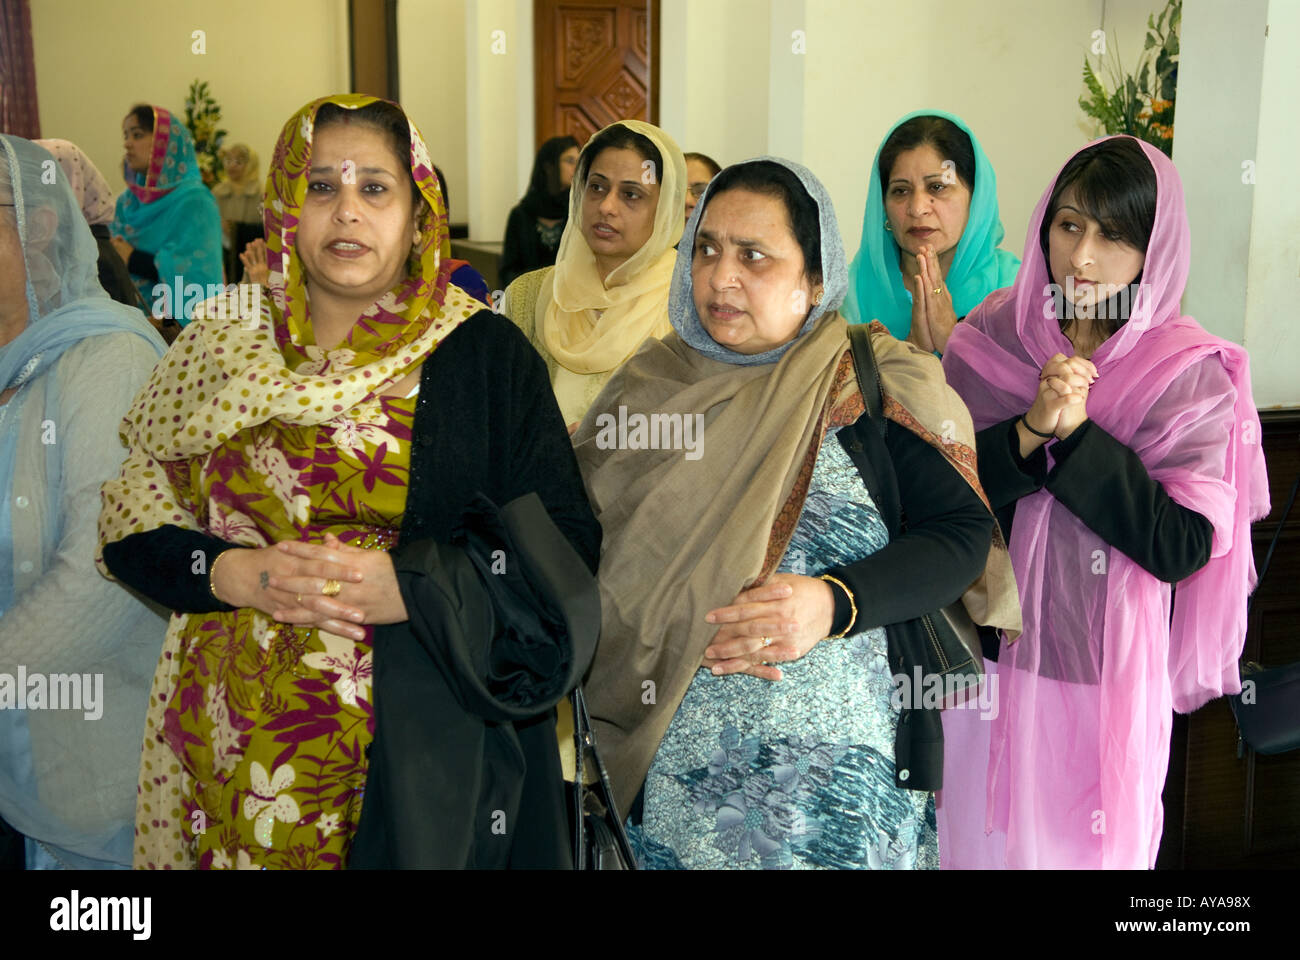 Gurdwara With People Stock Photos & Gurdwara With People